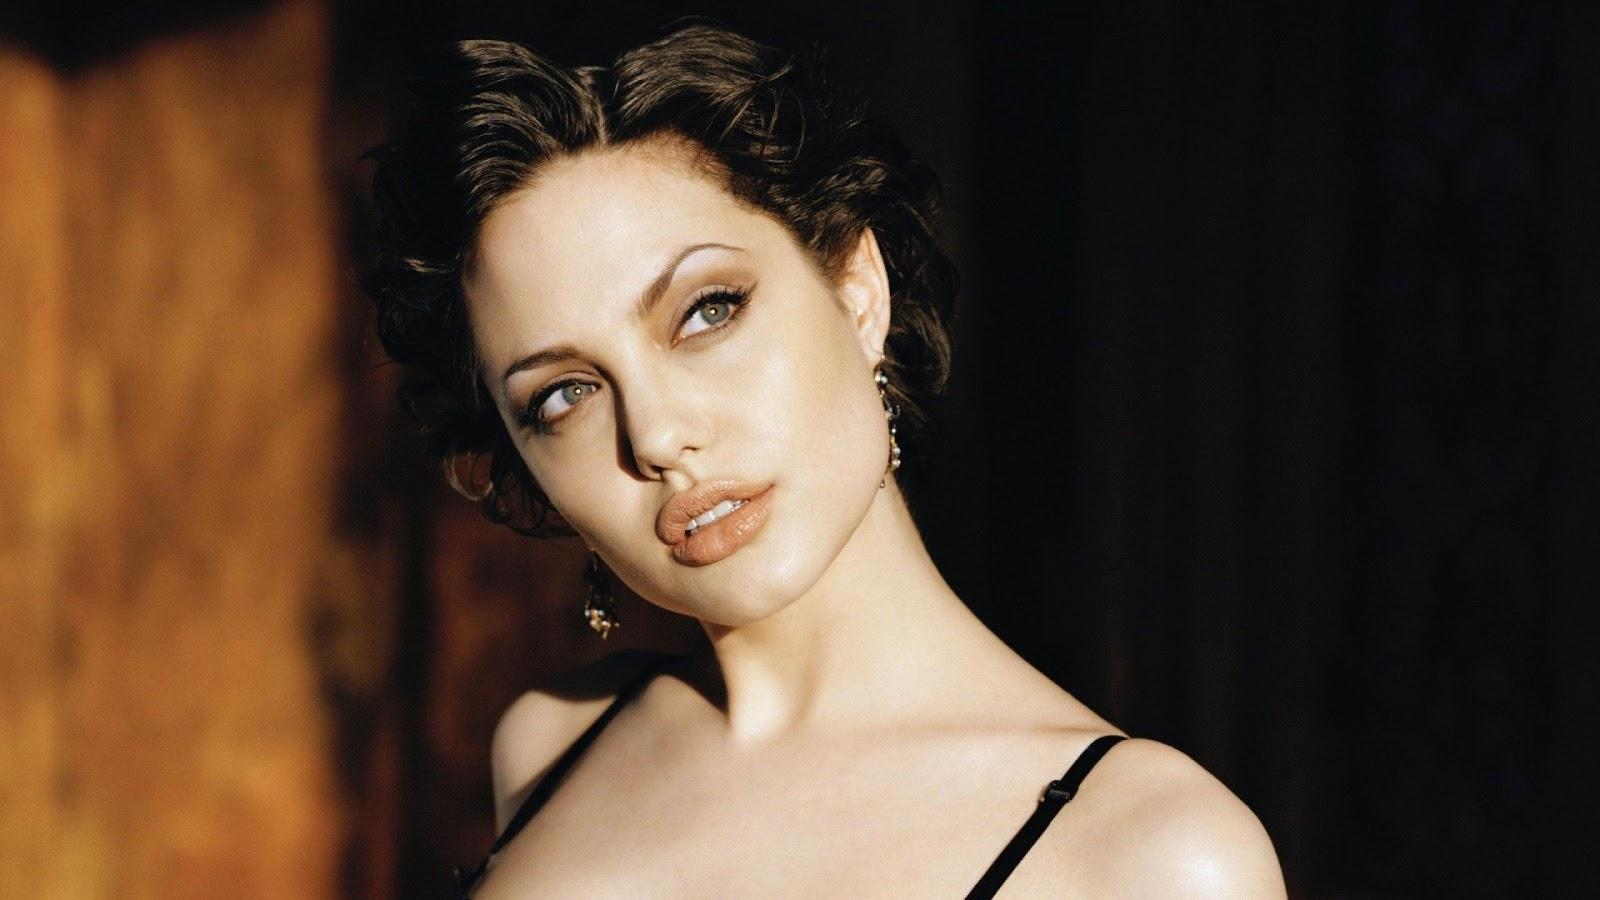 Angelina Jolie Hot Lips